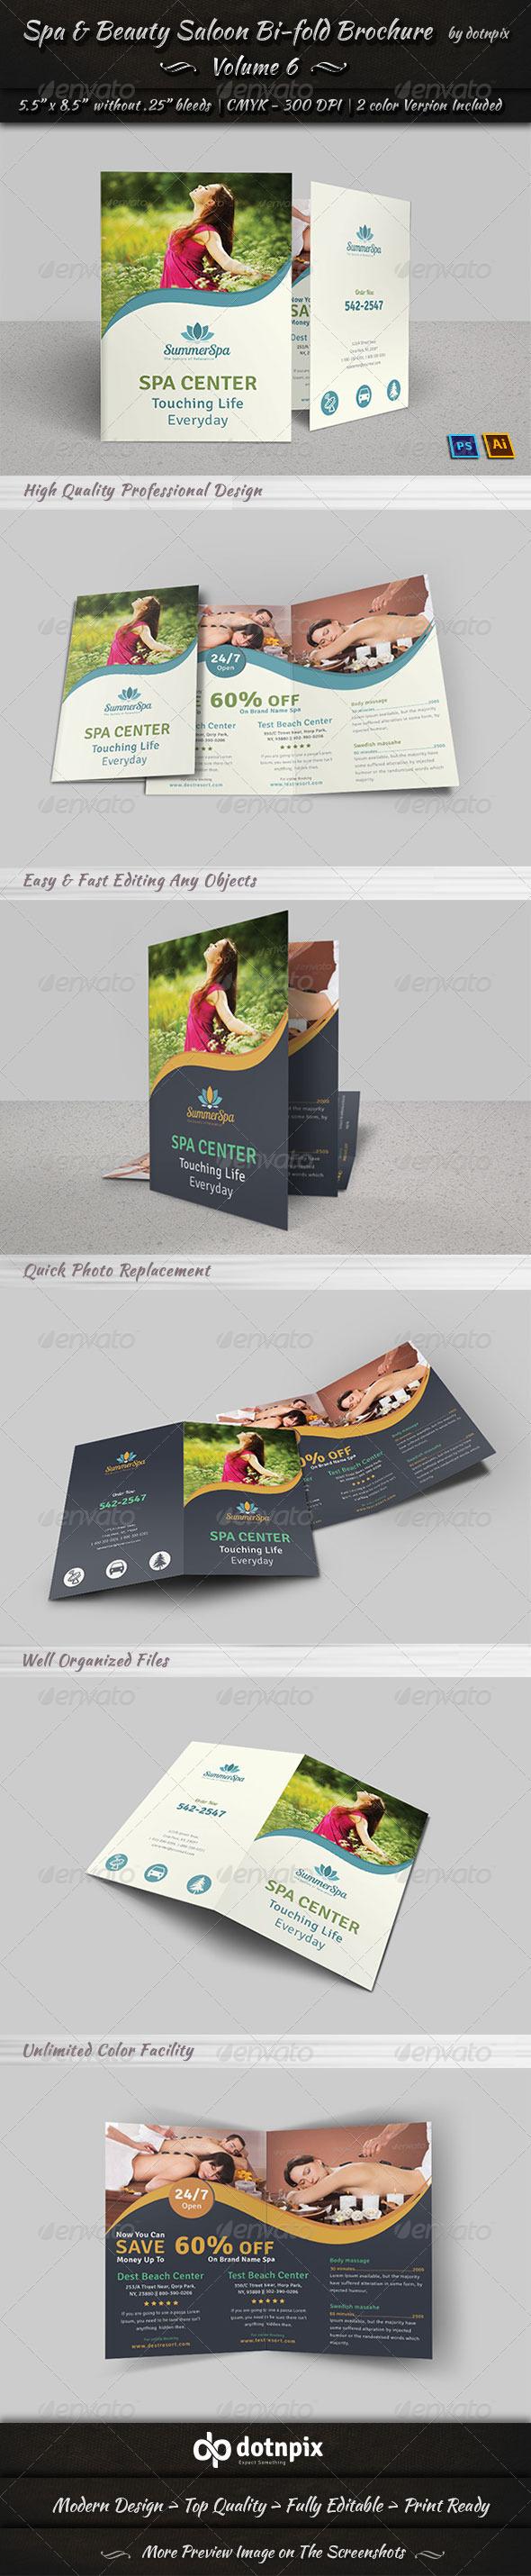 GraphicRiver Spa & Beauty Saloon Bi-fold Brochure Volume 6 7874093